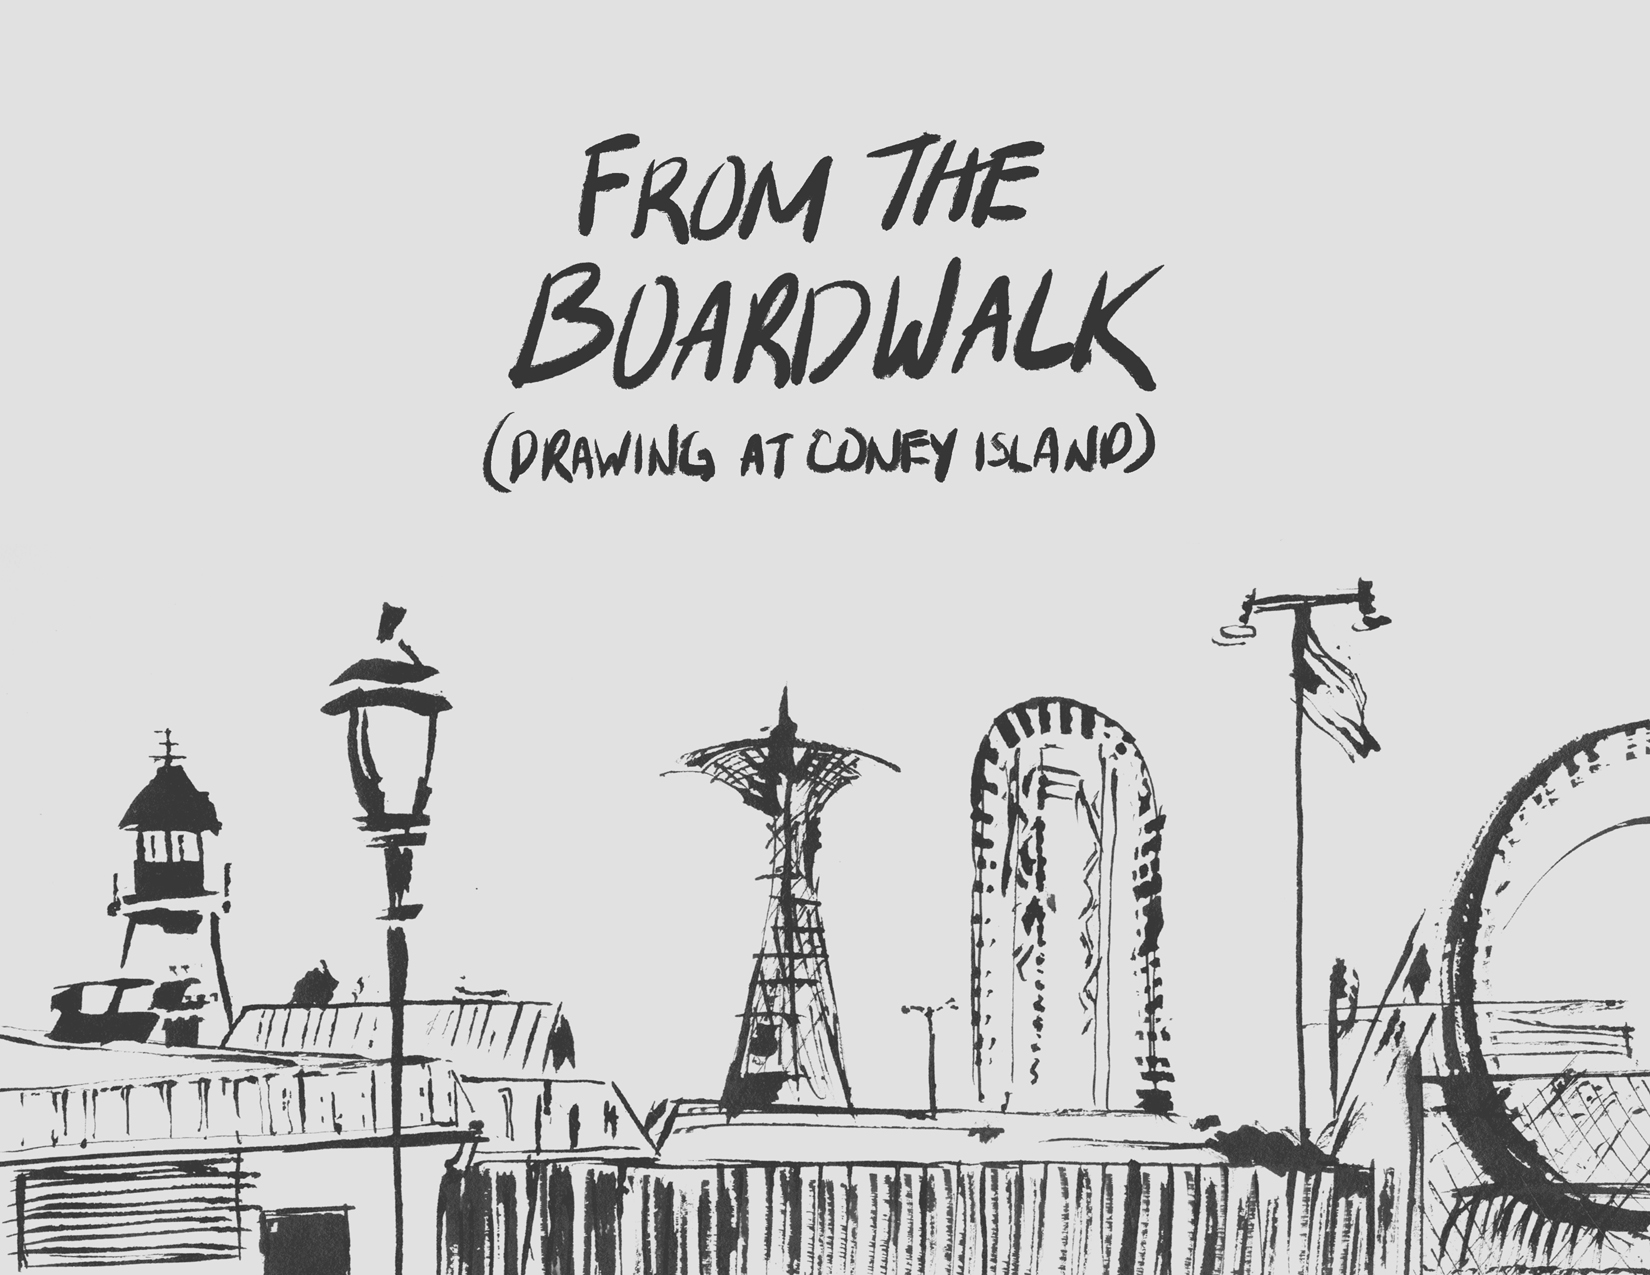 From the Boardwalk